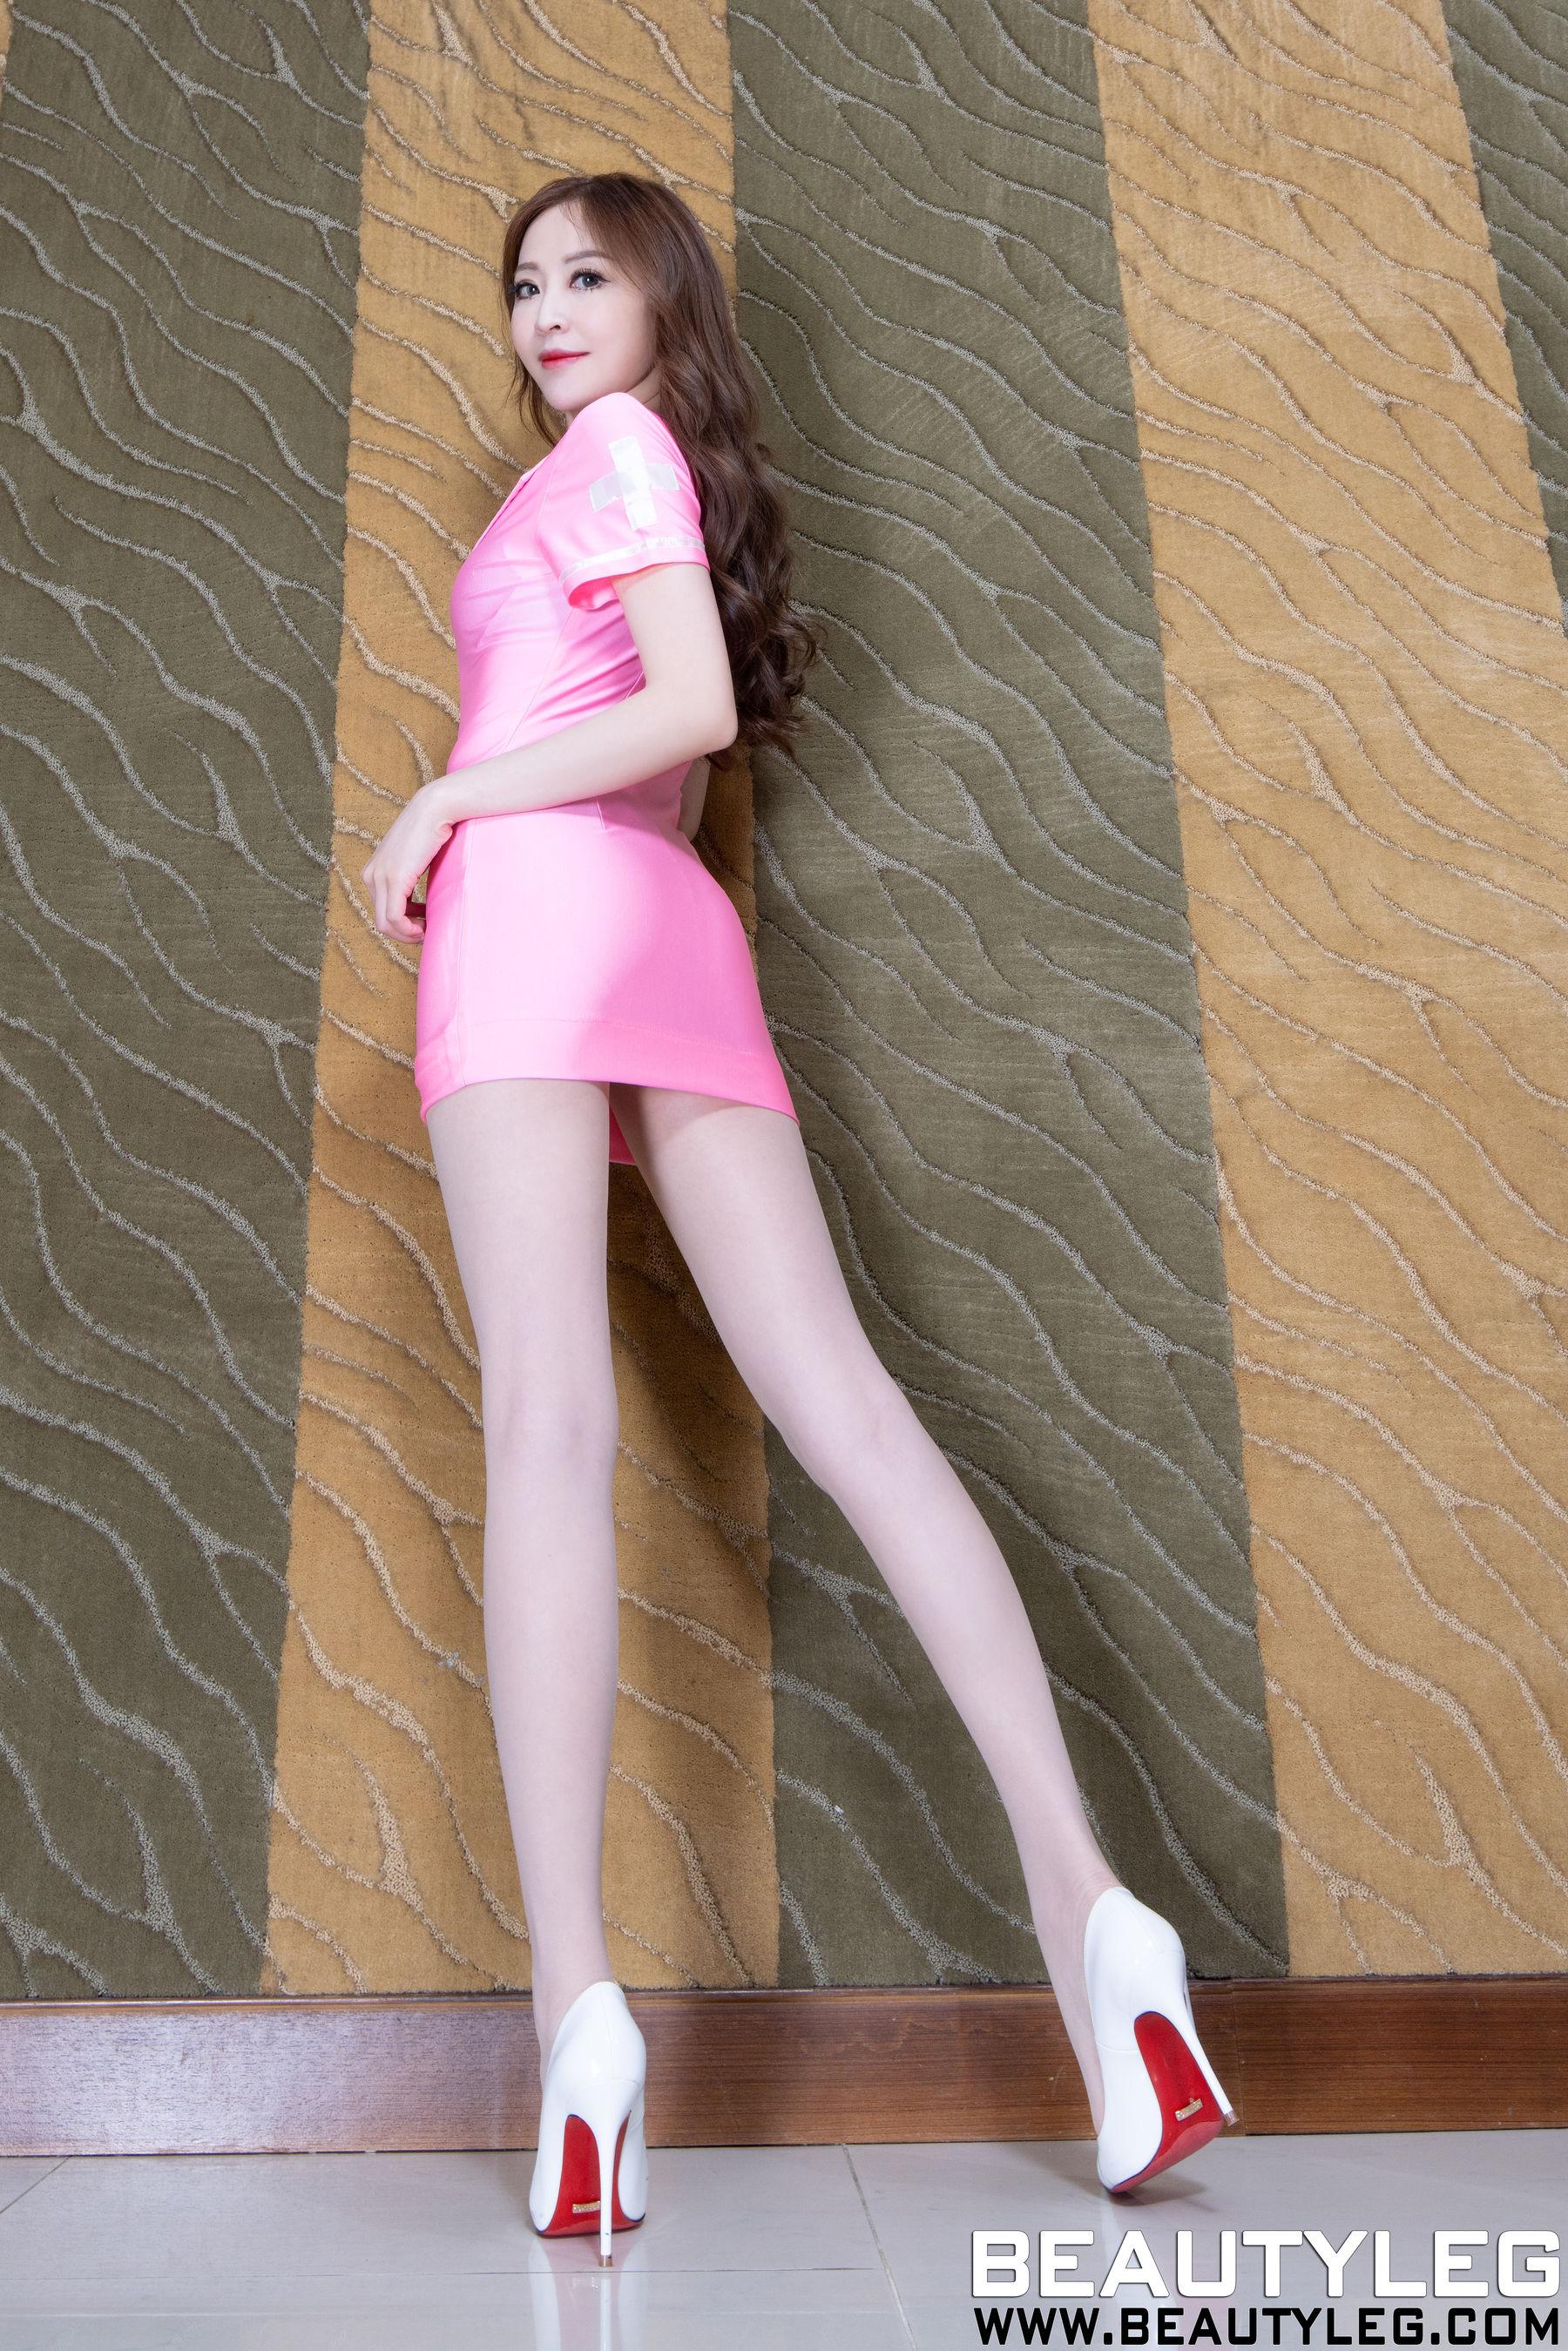 VOL.22 [Beautyleg]丝袜制服肉丝美腿:倪千凌(腿模Lucy,陈佳筠)超高清个人性感漂亮大图(43P)